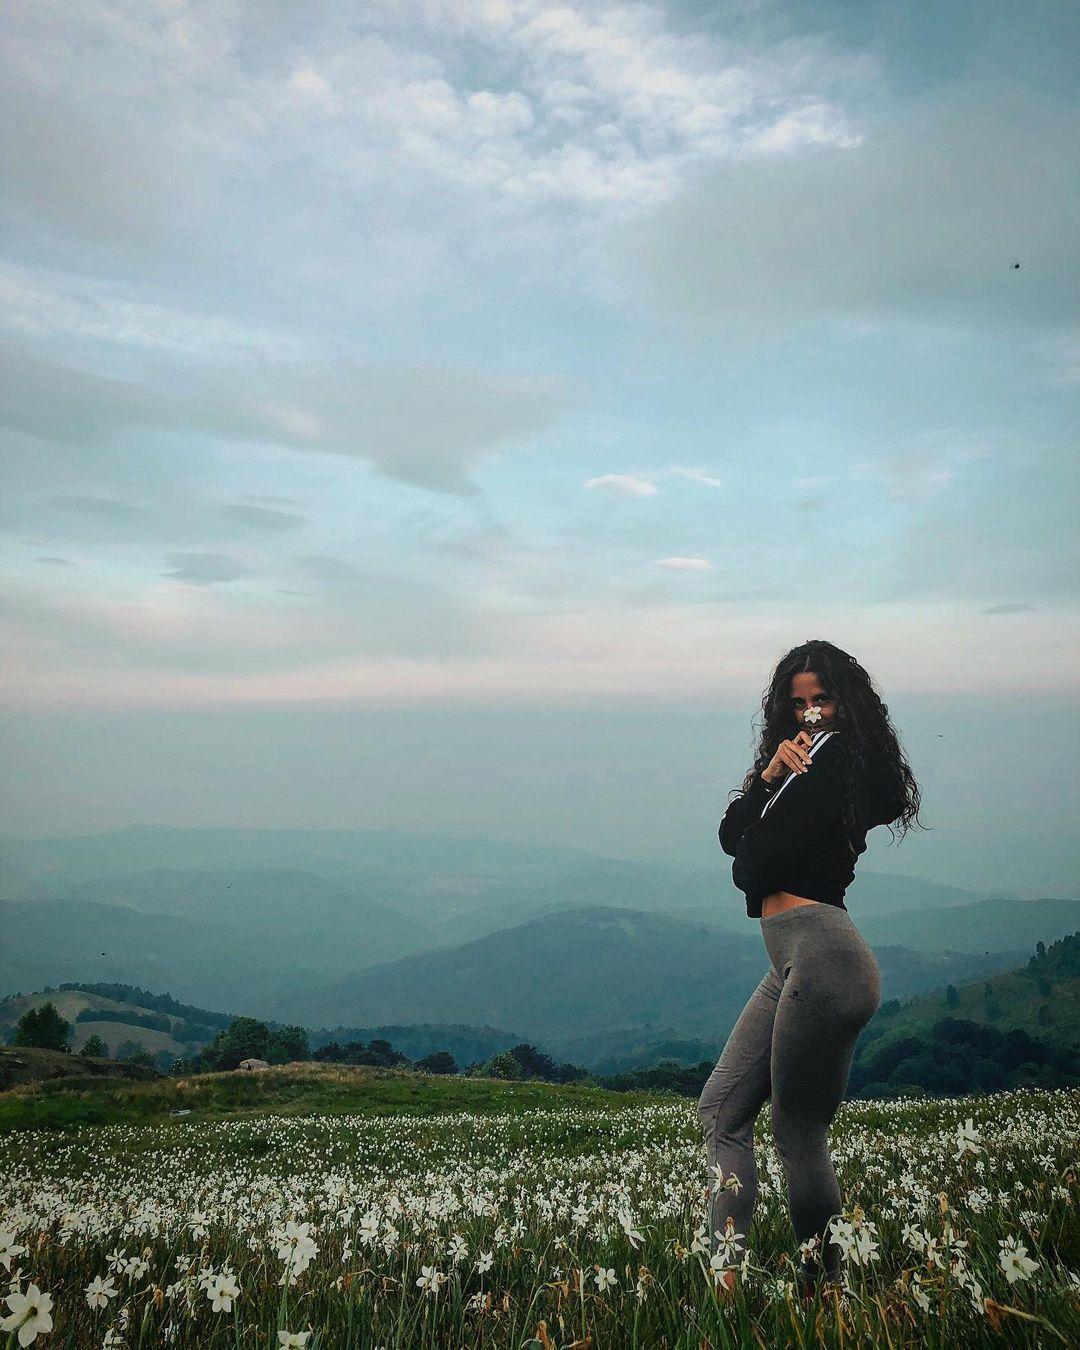 J'ai envie dedécouvrir le monde🧳 ✈️ • • • #exploring #traveller #travelgirl #discovery #flowers #naturephotography #nature #skyline #view #girlpic #postoftheday #postcard #body #bodypositive